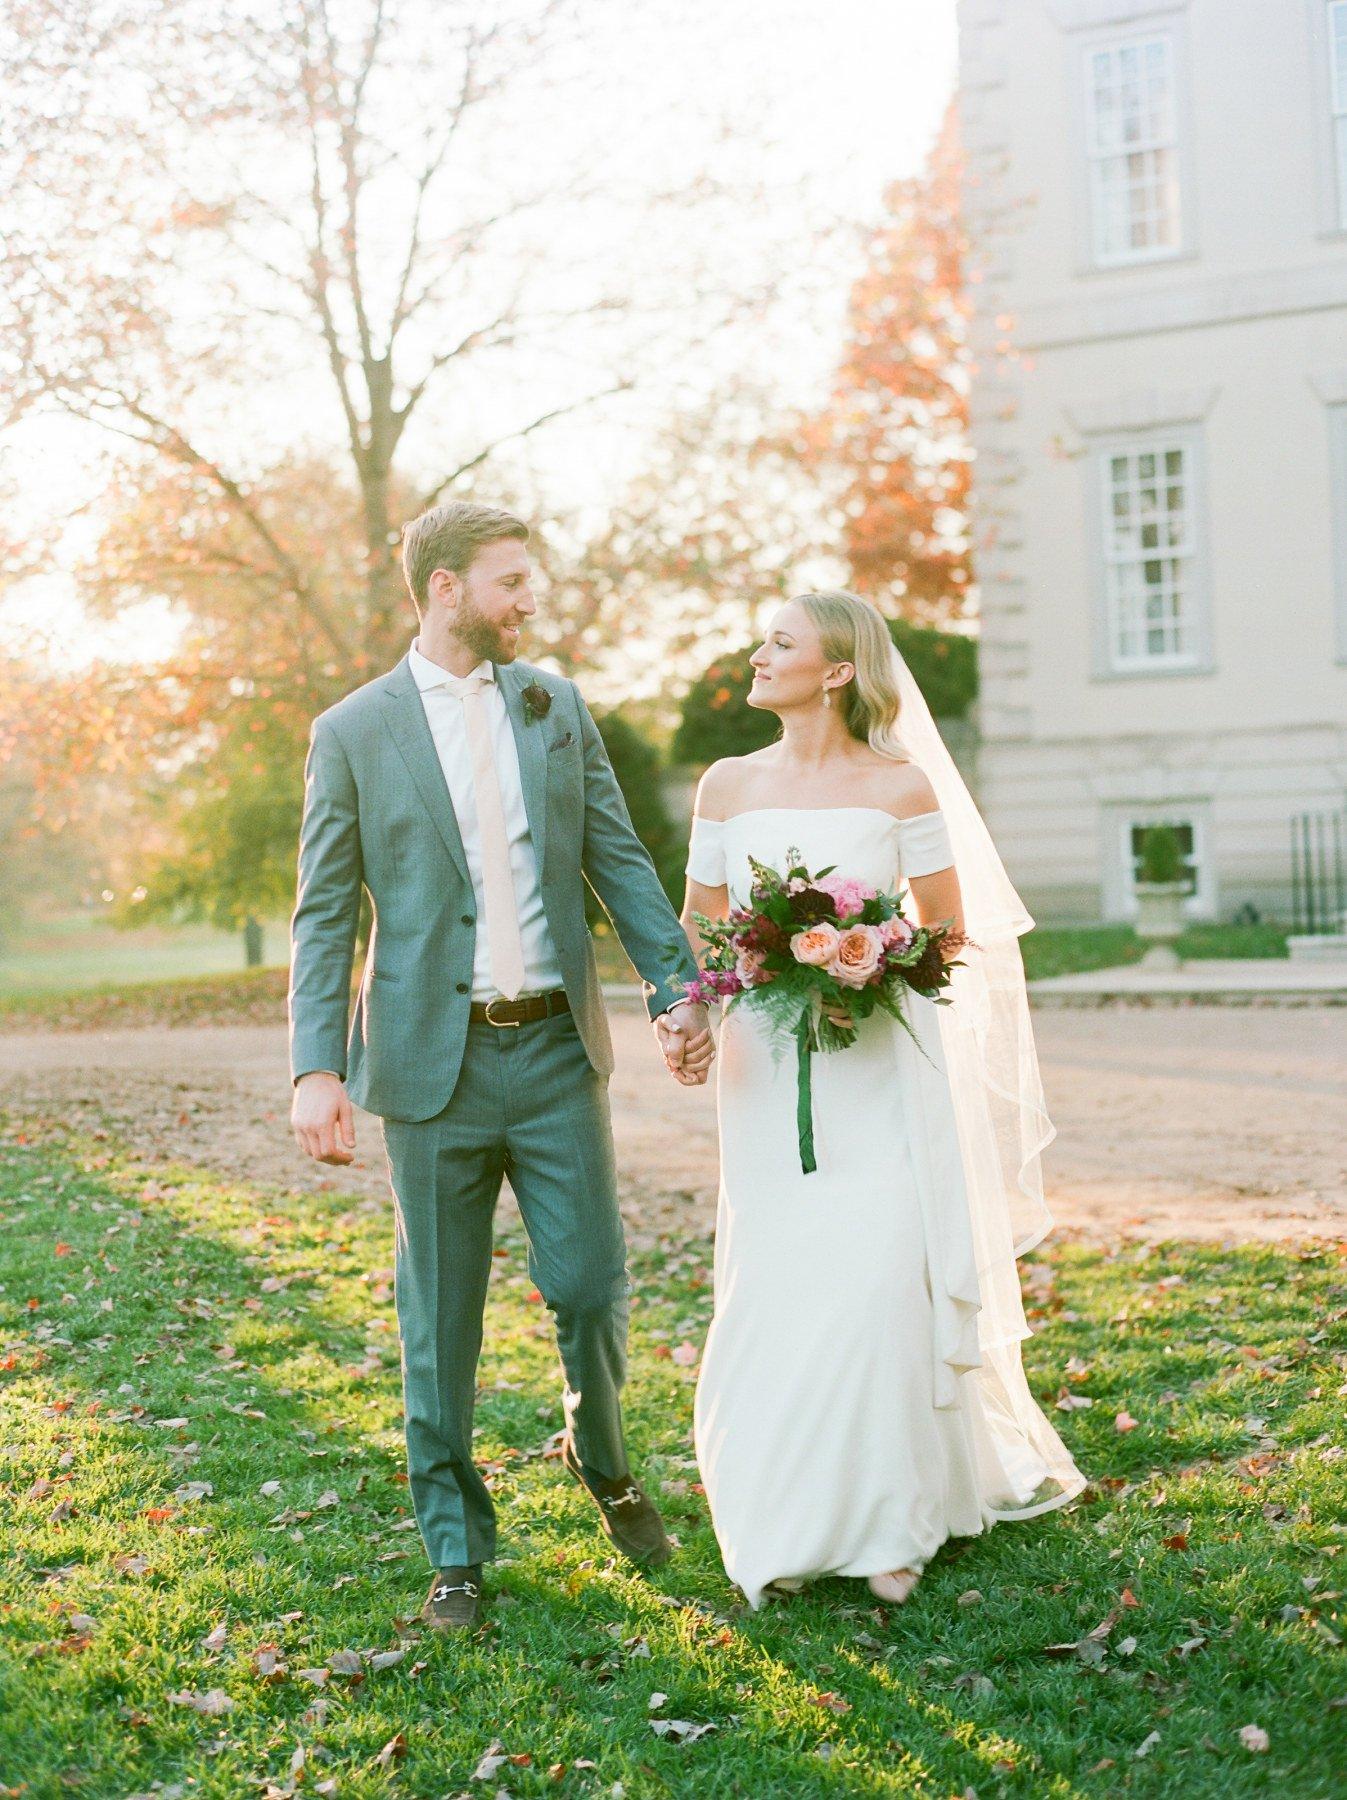 49Great_Marsh_Estates_Wedding_Anne_Kelley_Events_Astrid_Photography146486030002-2